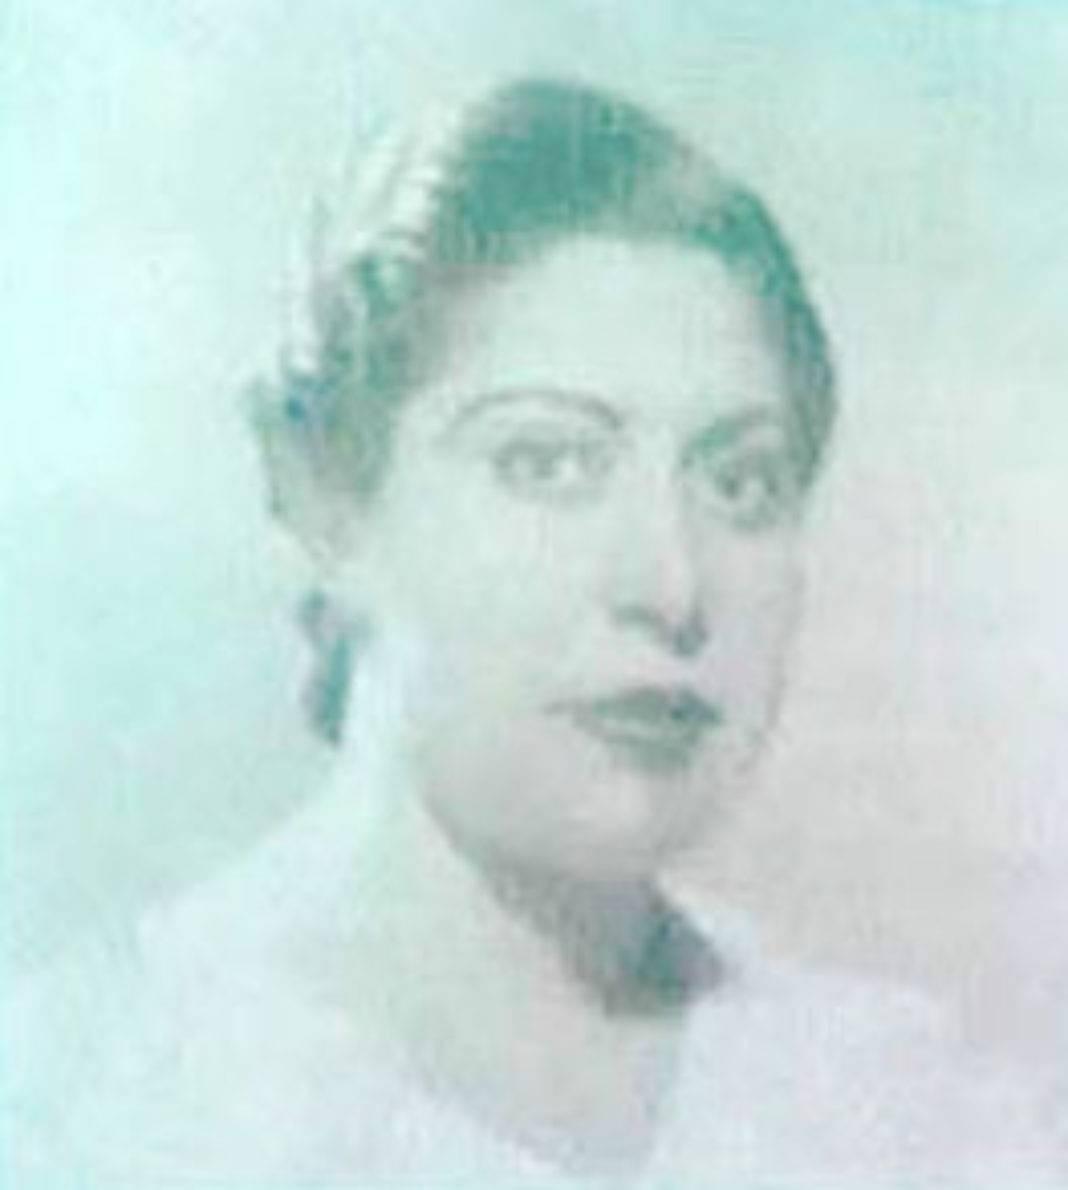 Homenaje a la pionera Elvira Fernández-Almoguera Casas 5